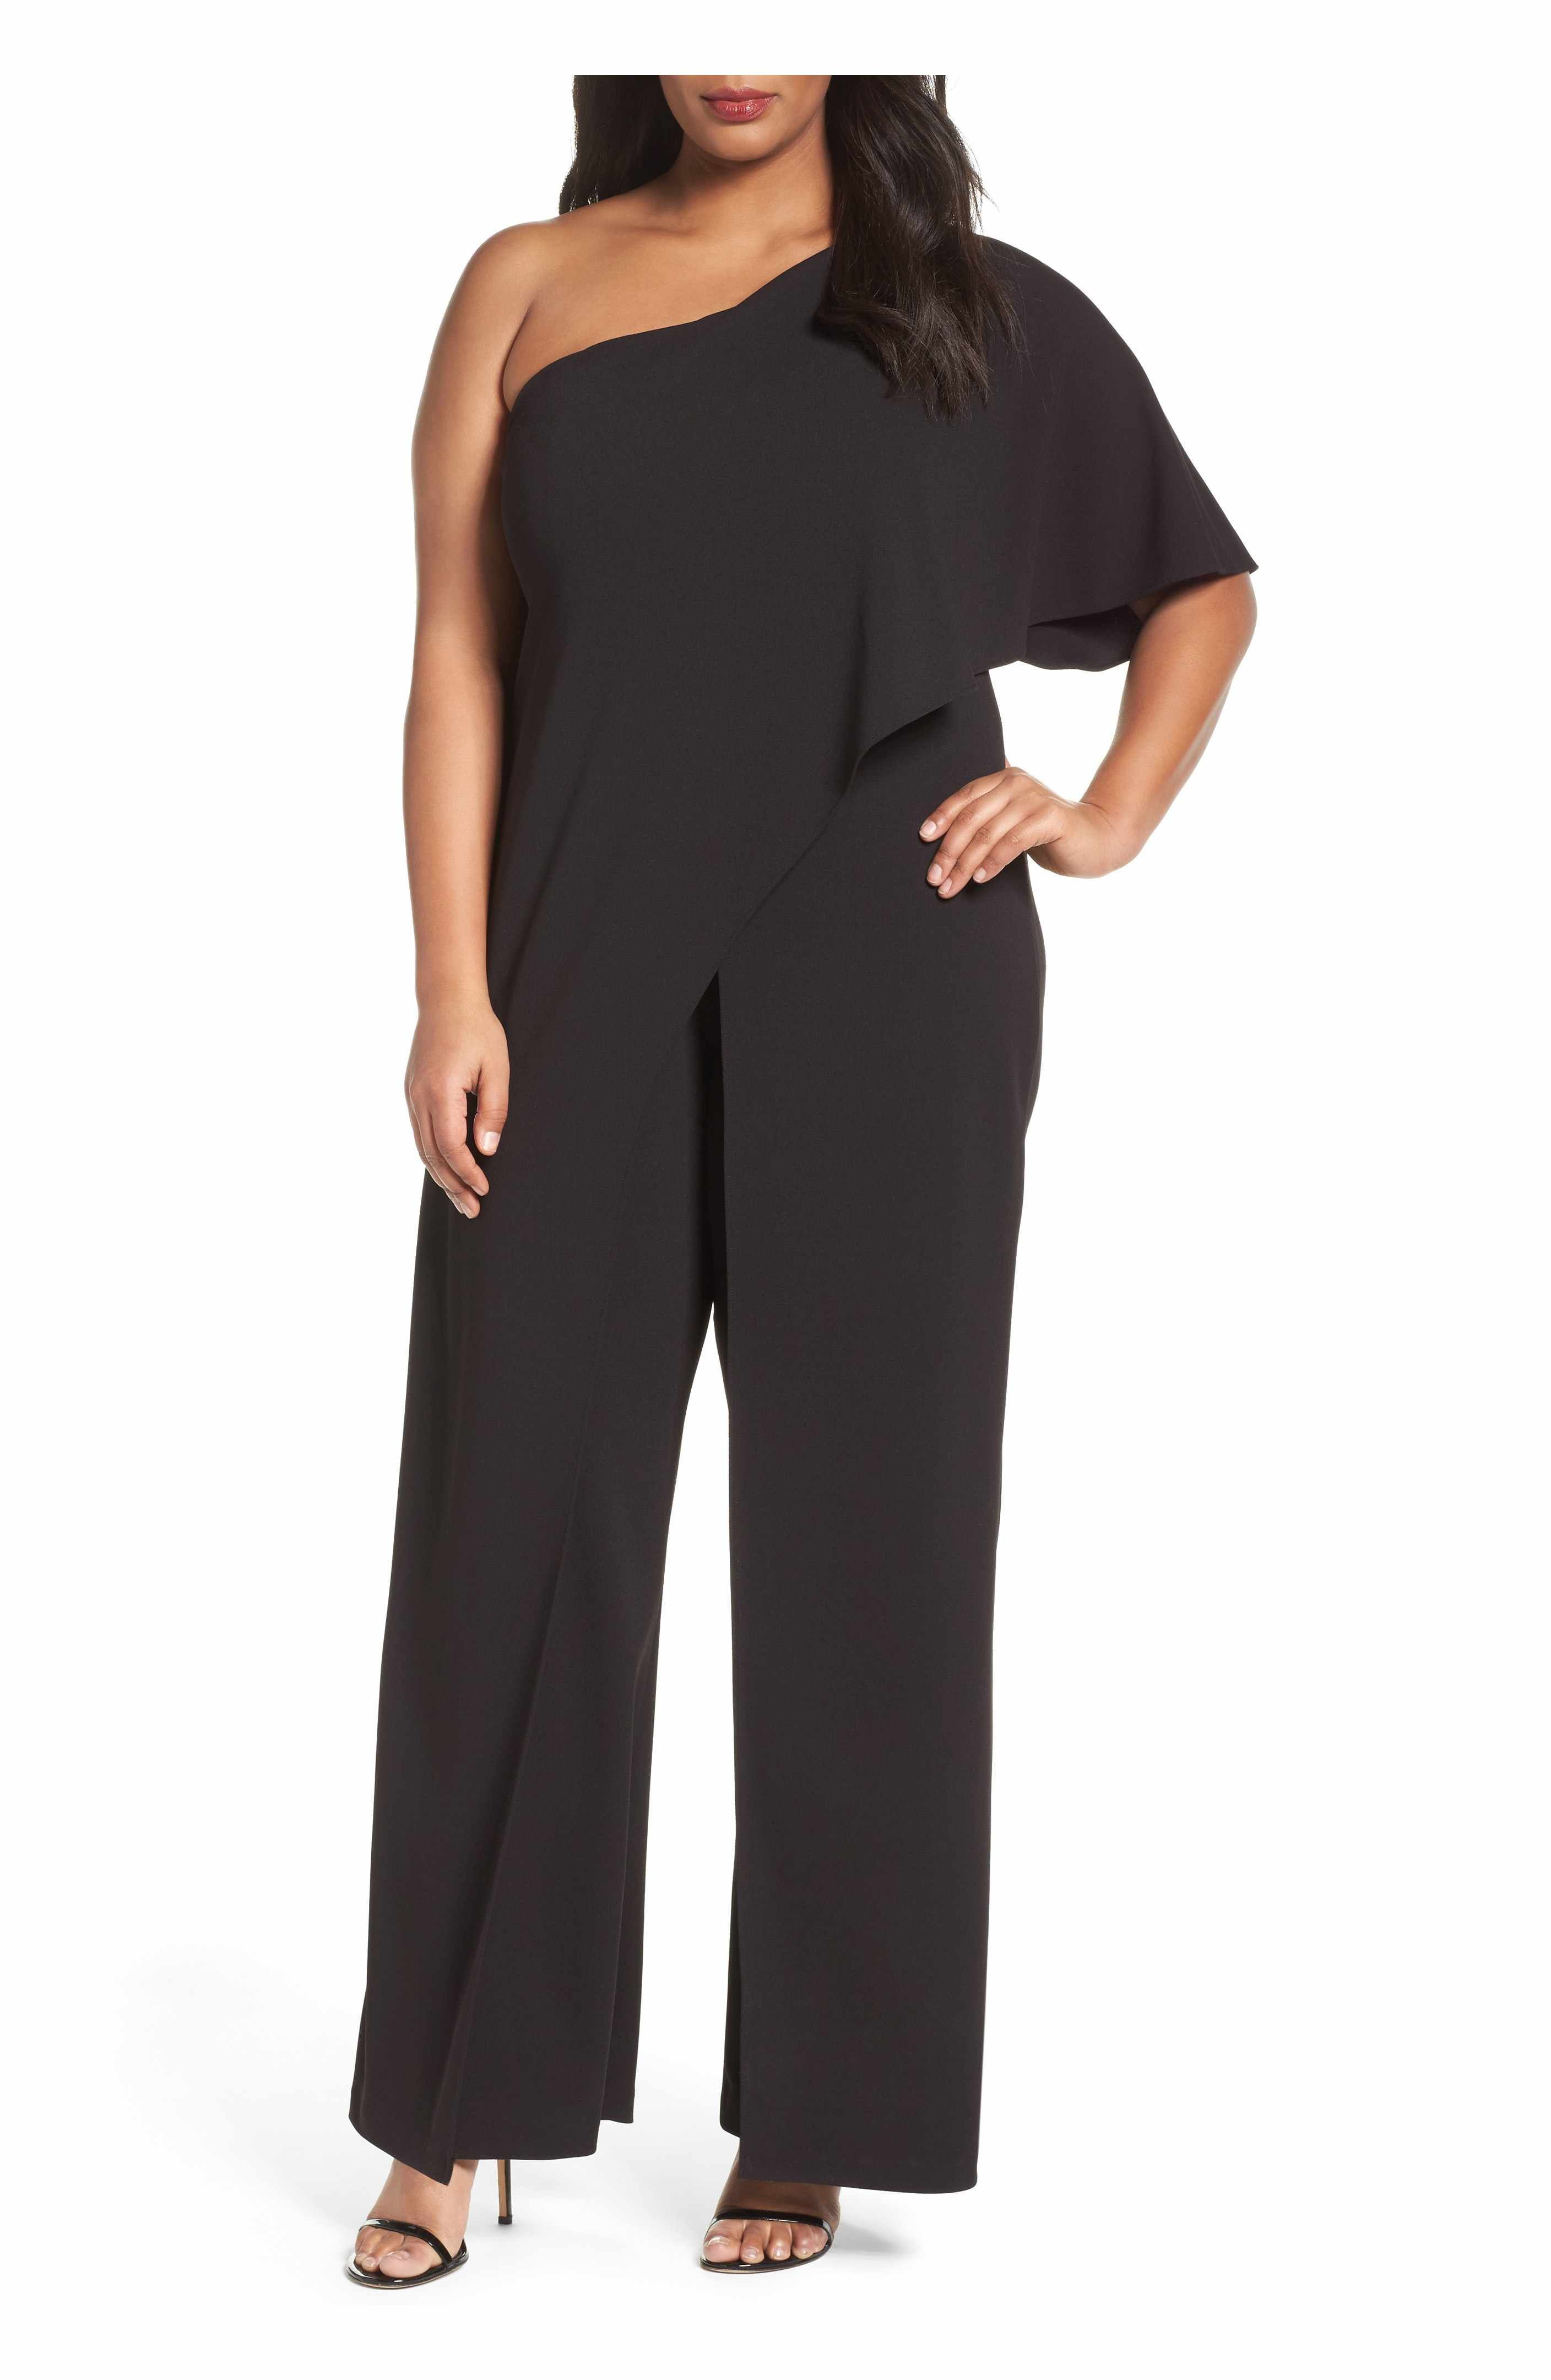 Adrianna papell oneshoulder jumpsuit plus size